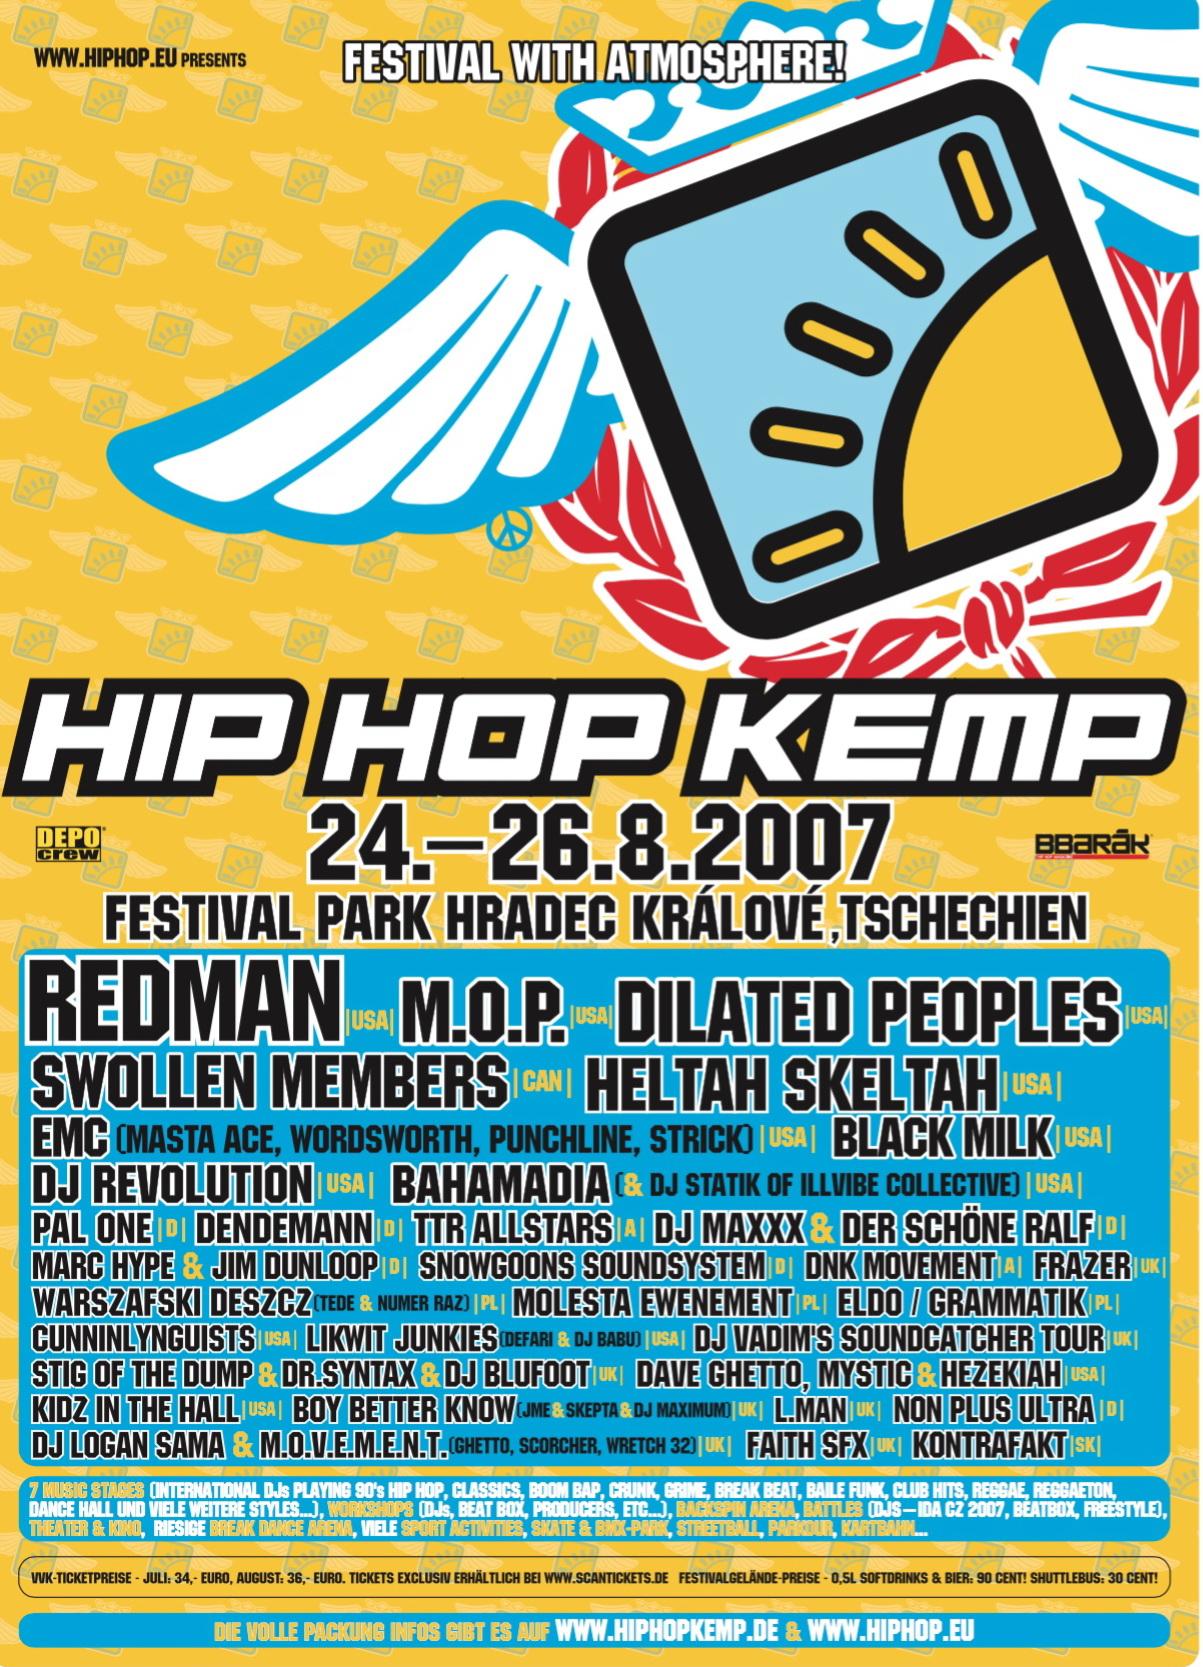 Hip Hop Kemp 2007